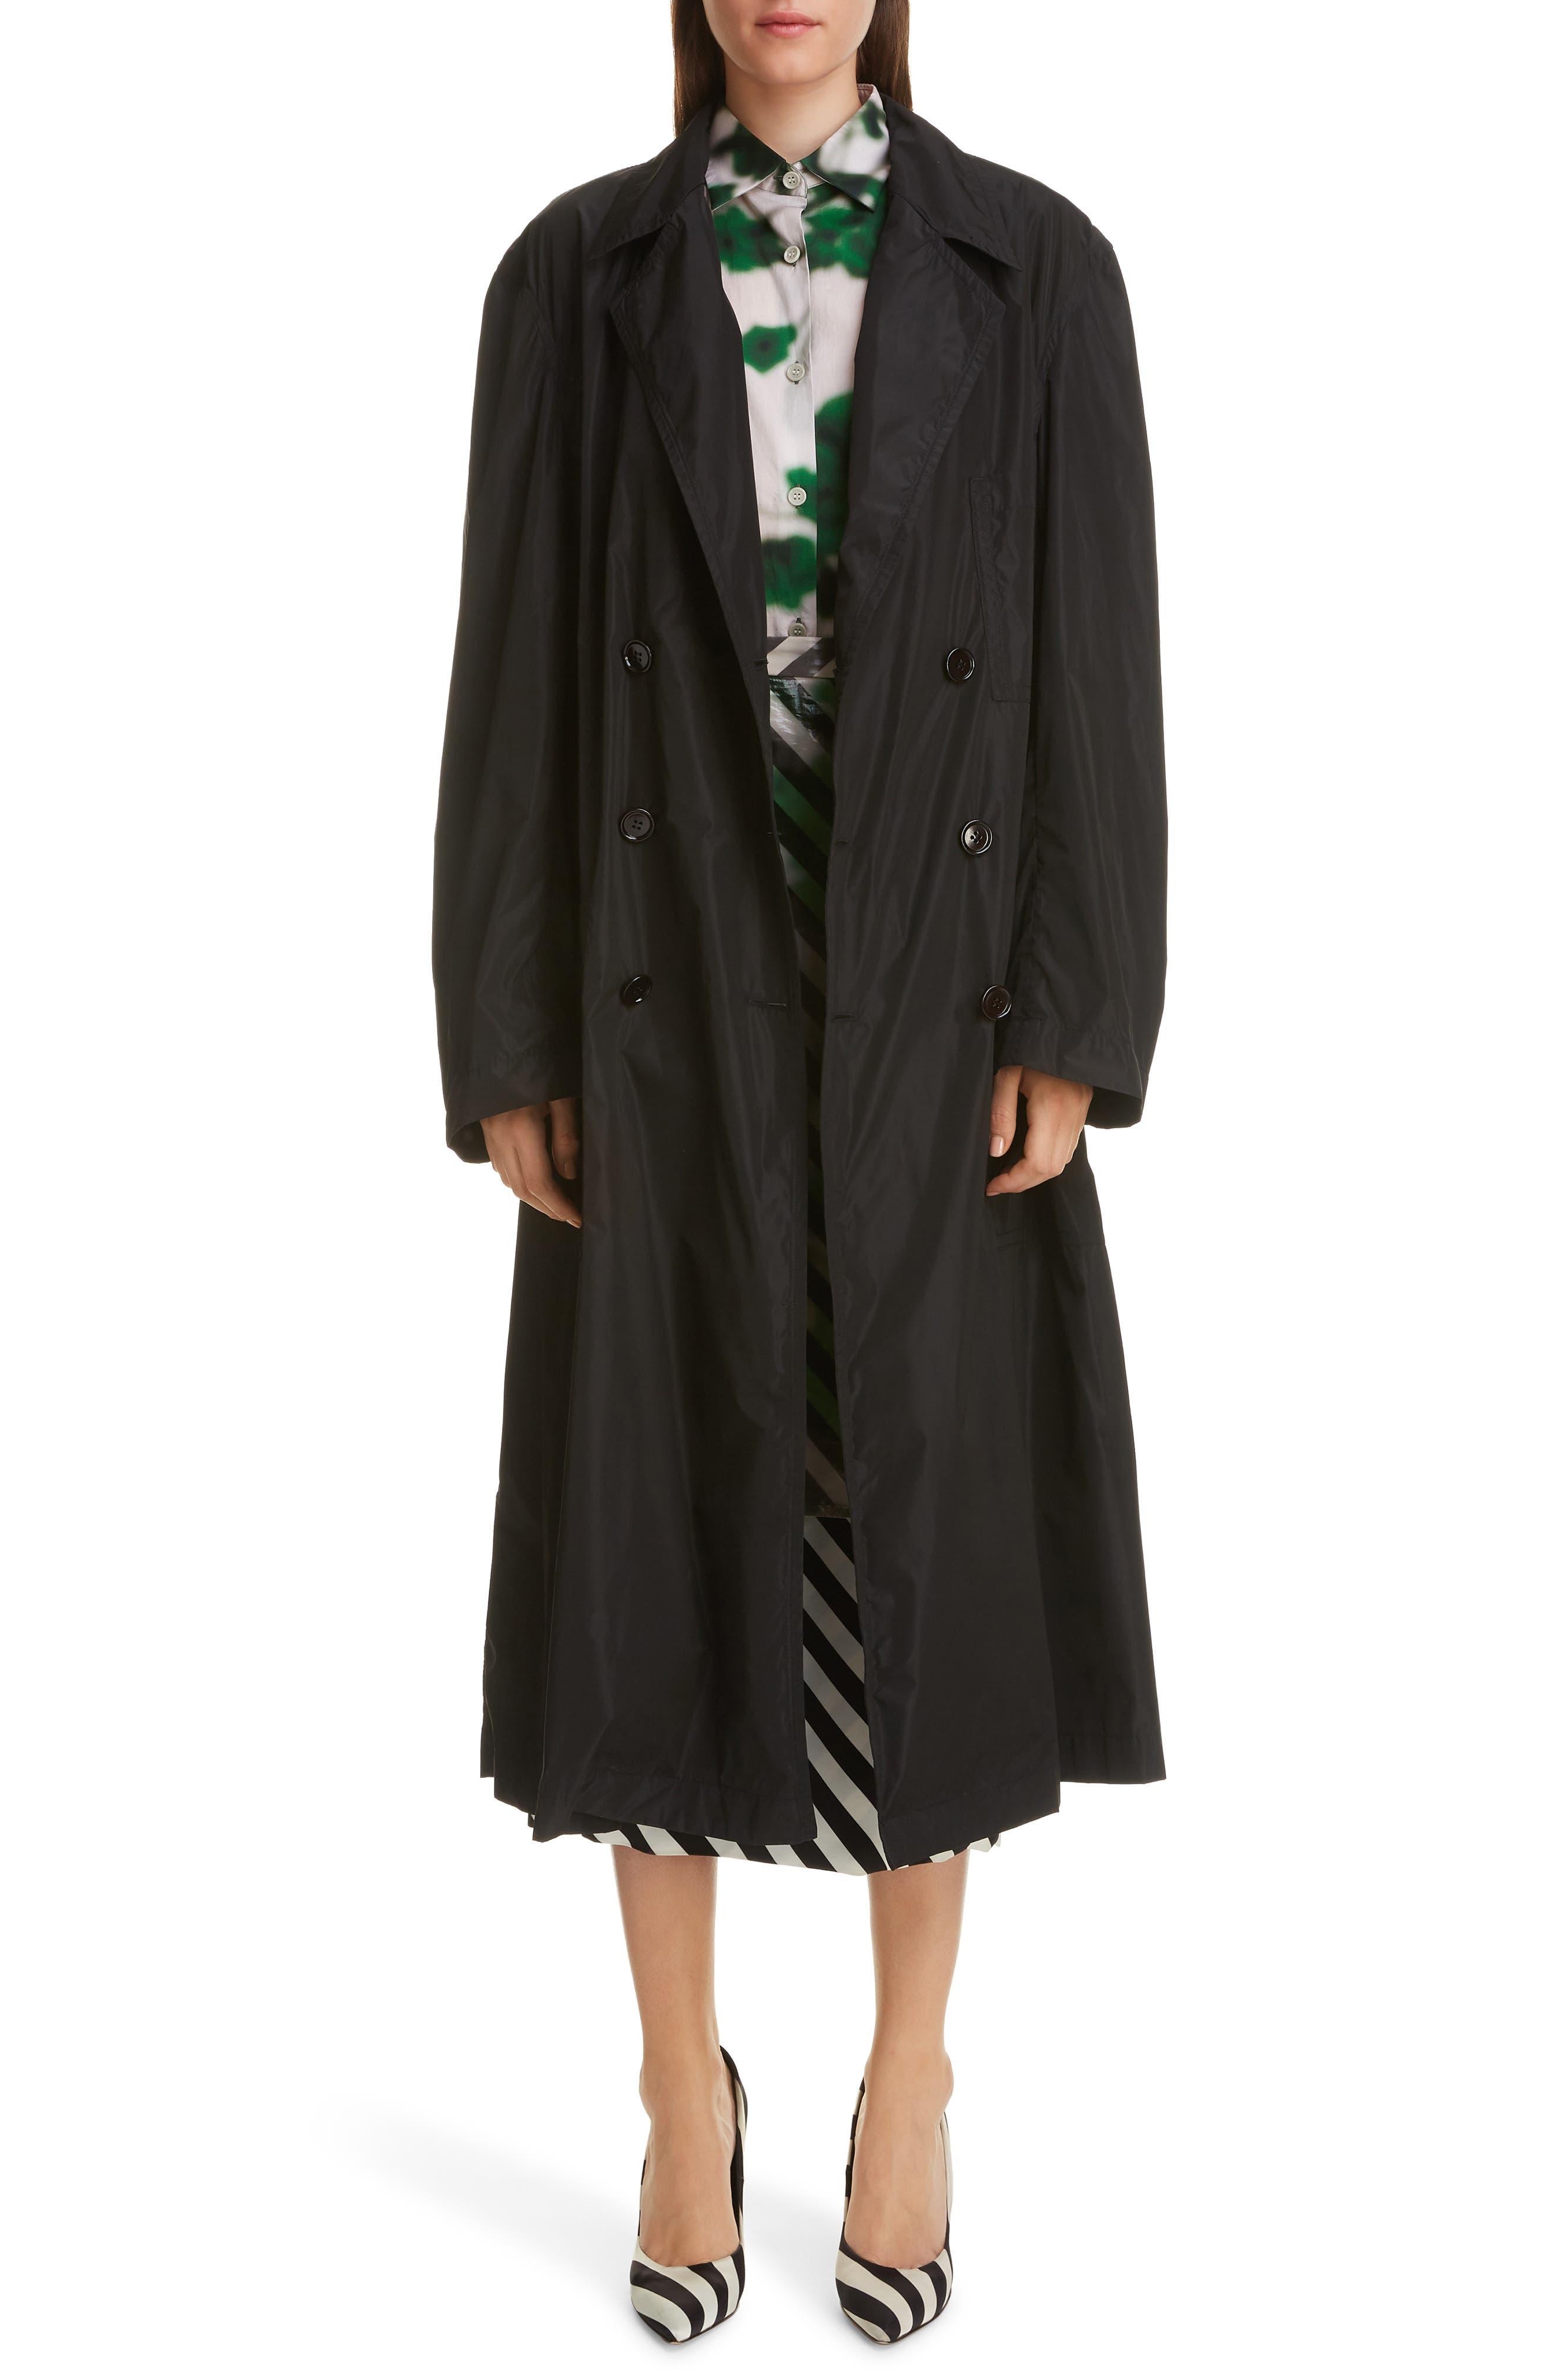 DRIES VAN NOTEN, Dires Van Noten Painted Overlay Silk Blend Pencil Skirt, Alternate thumbnail 6, color, 604-GREEN